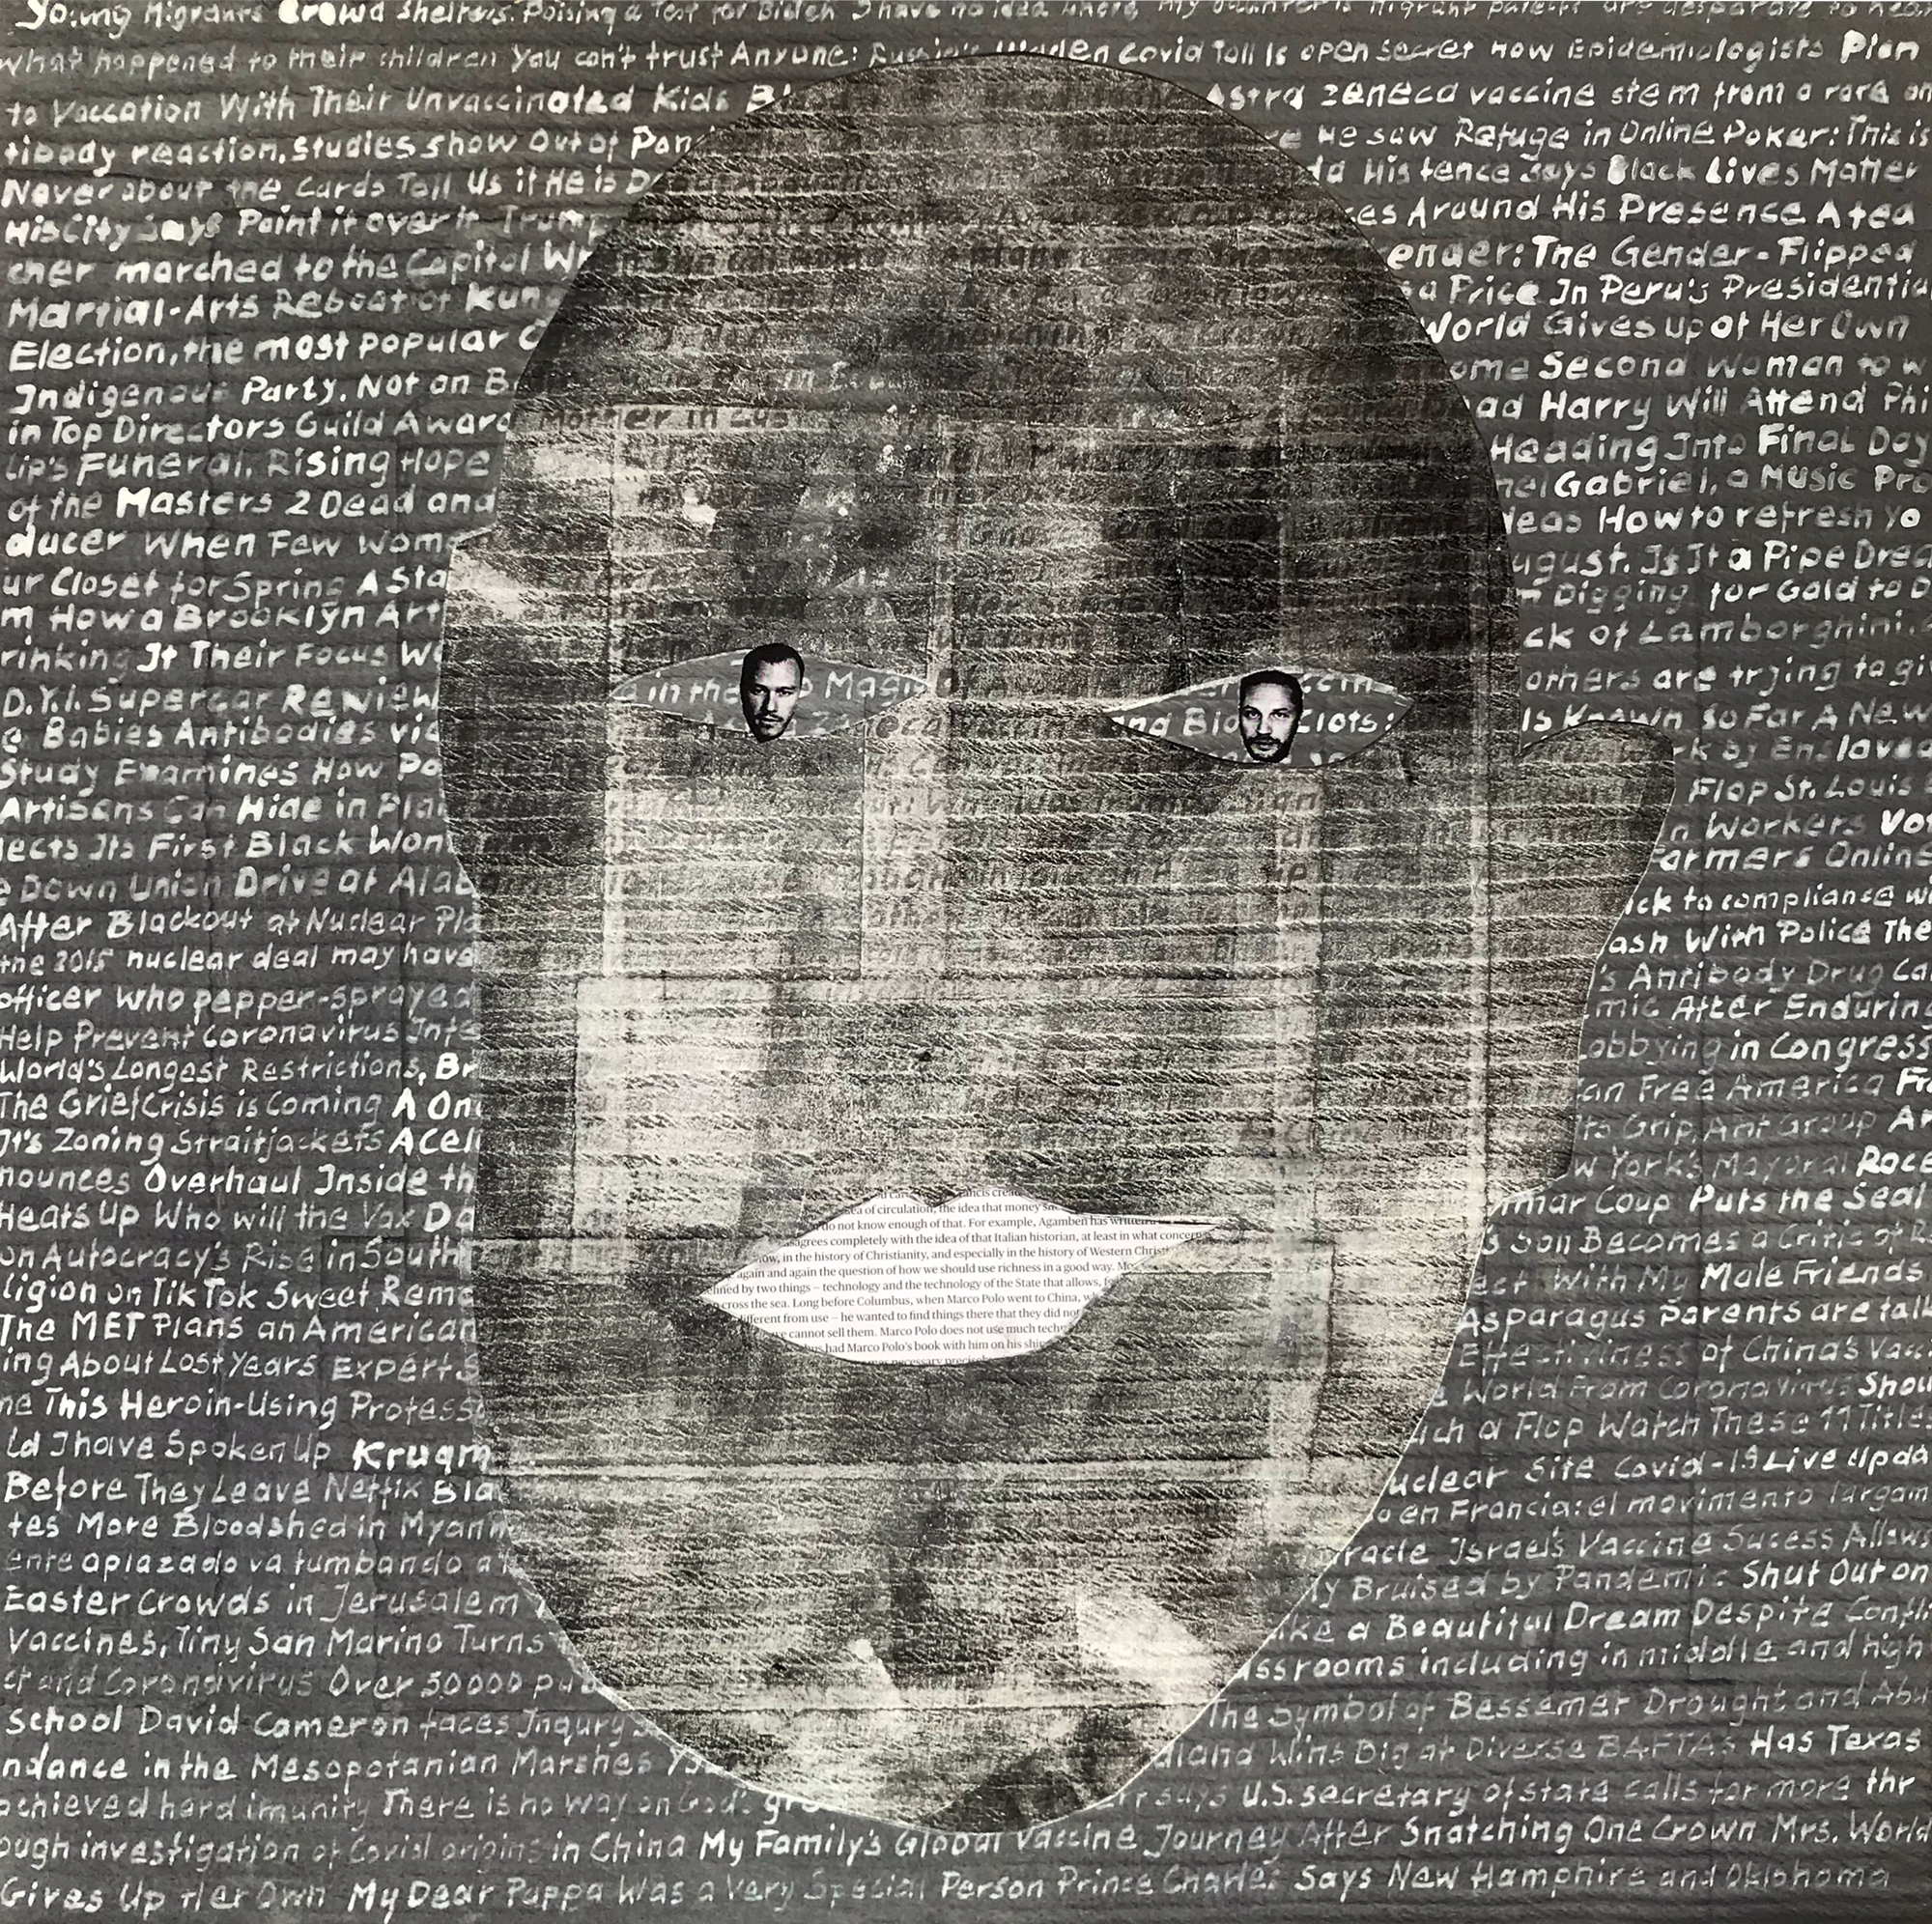 Newspaper portrait - 10